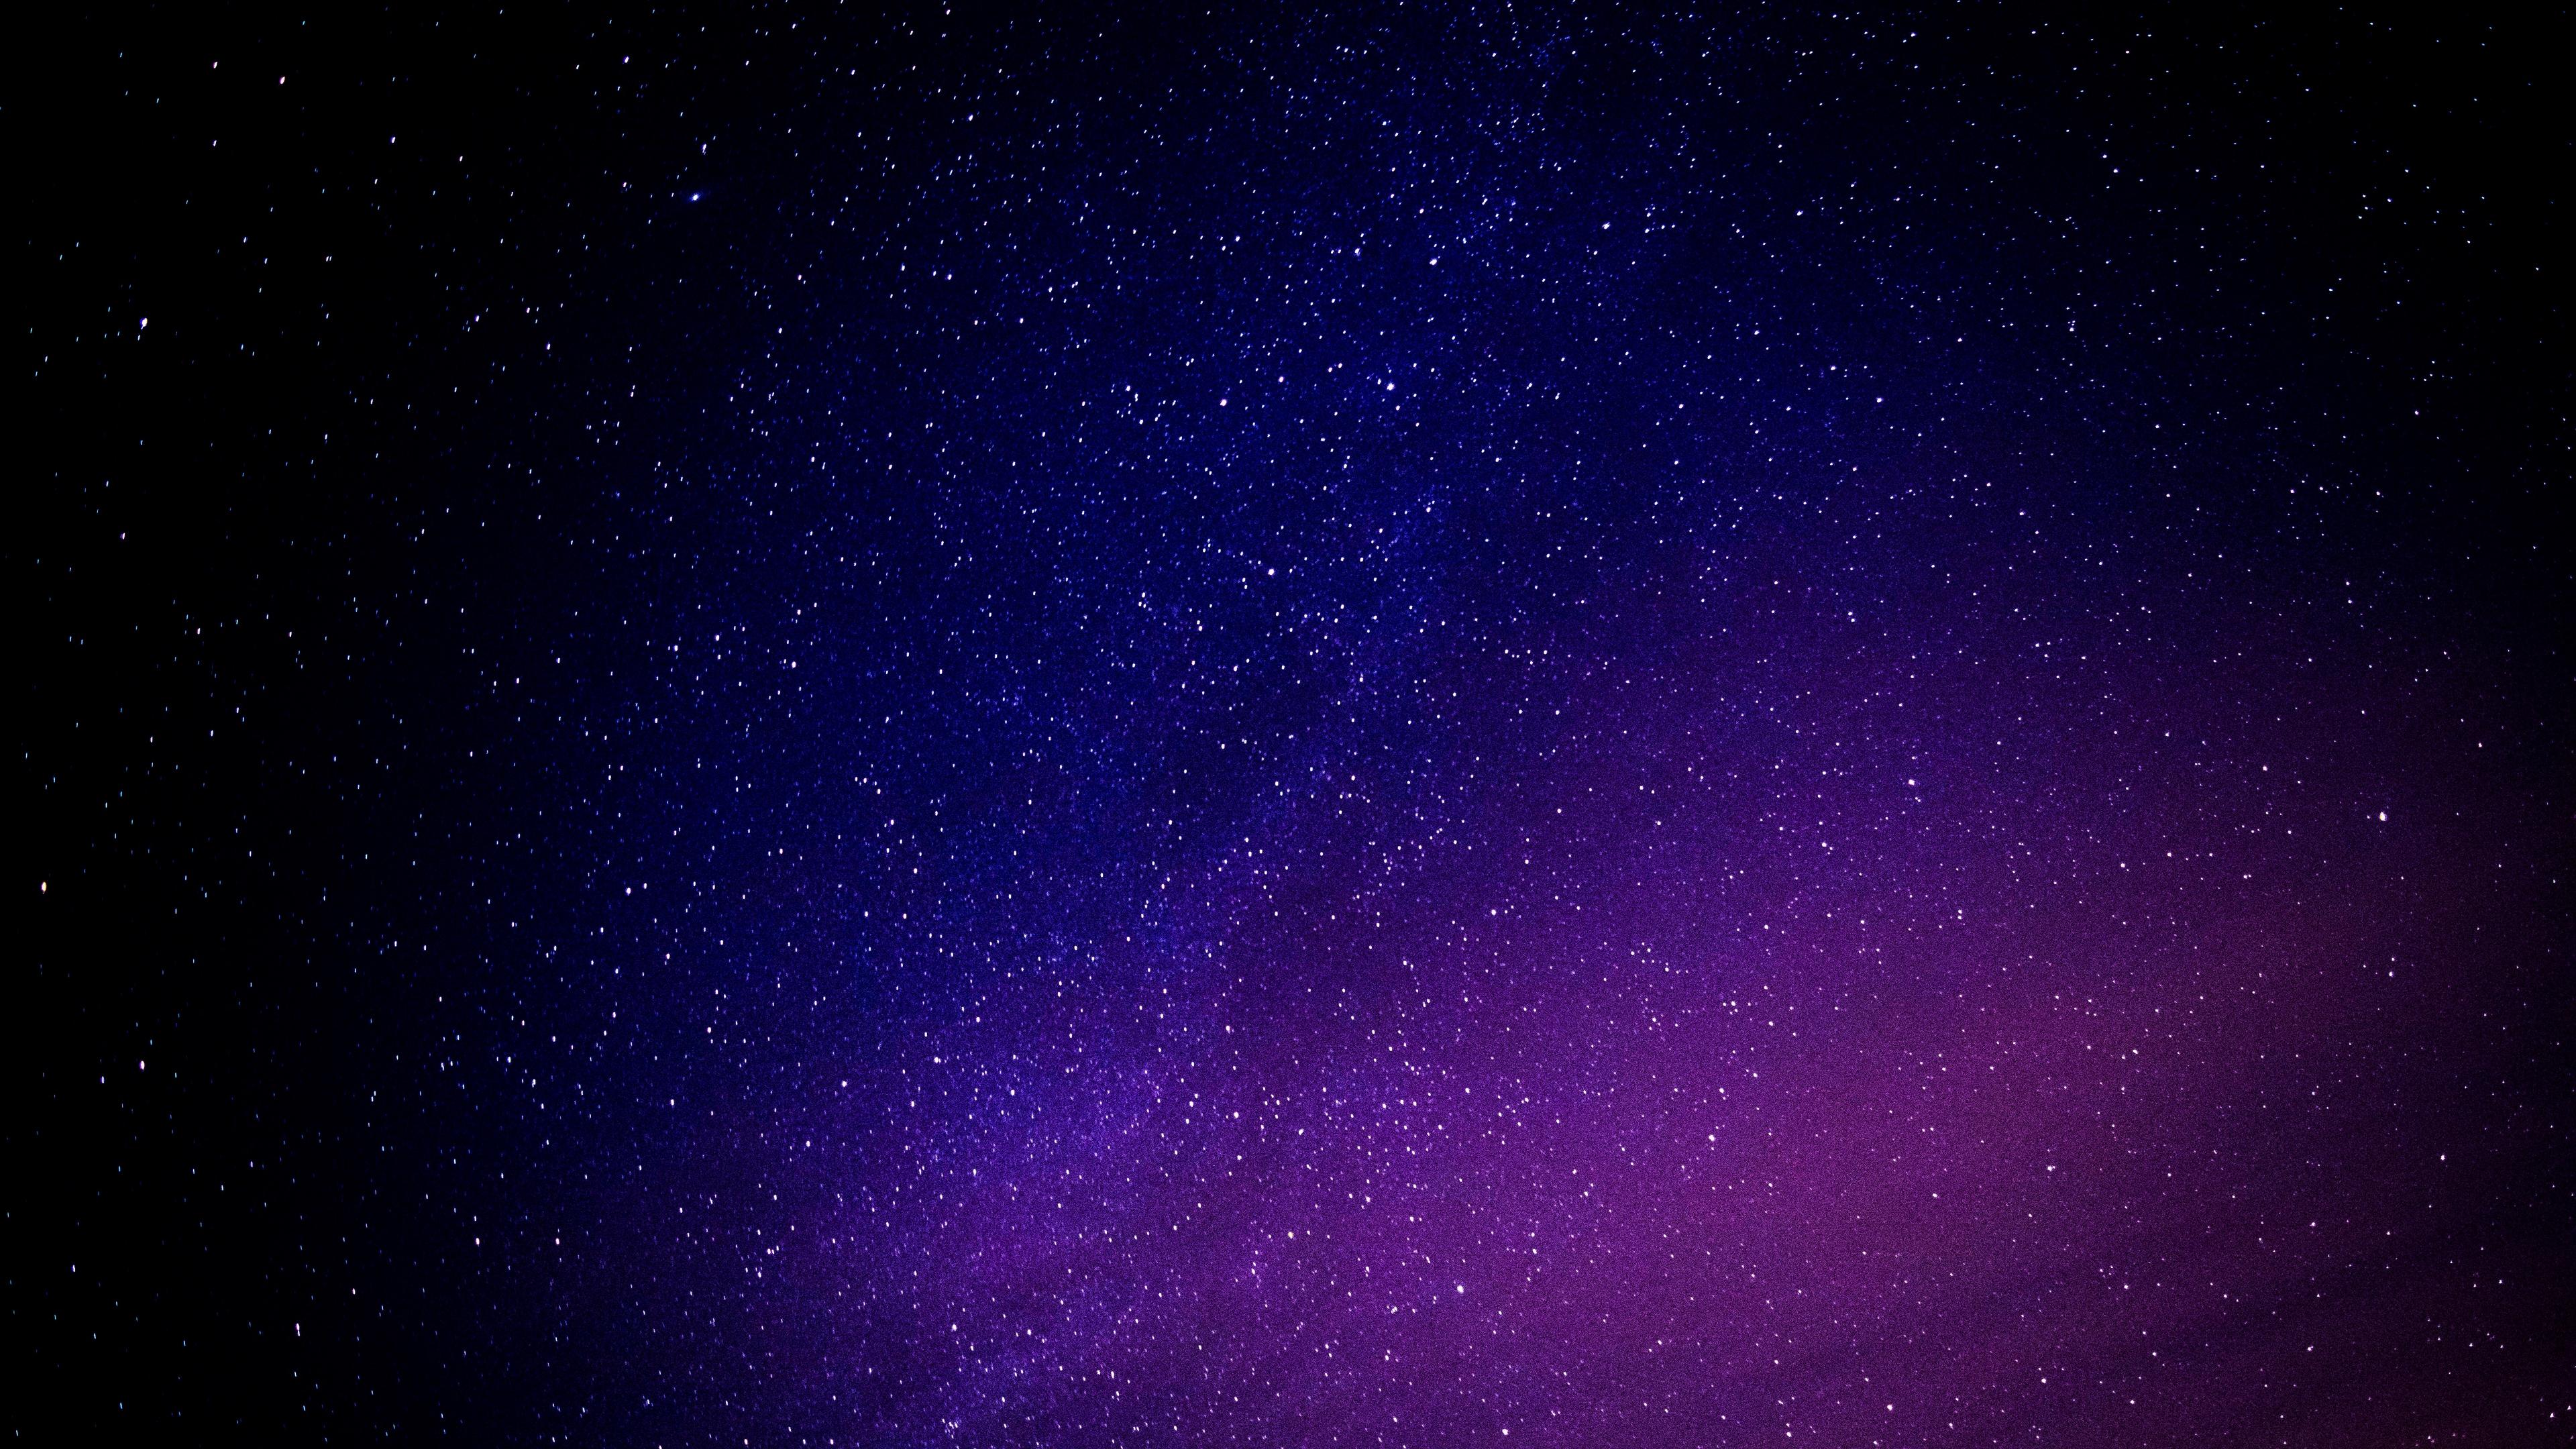 starry sky galaxy glitter night 4k 1536016168 - starry sky, galaxy, glitter, night 4k - starry sky, Glitter, Galaxy